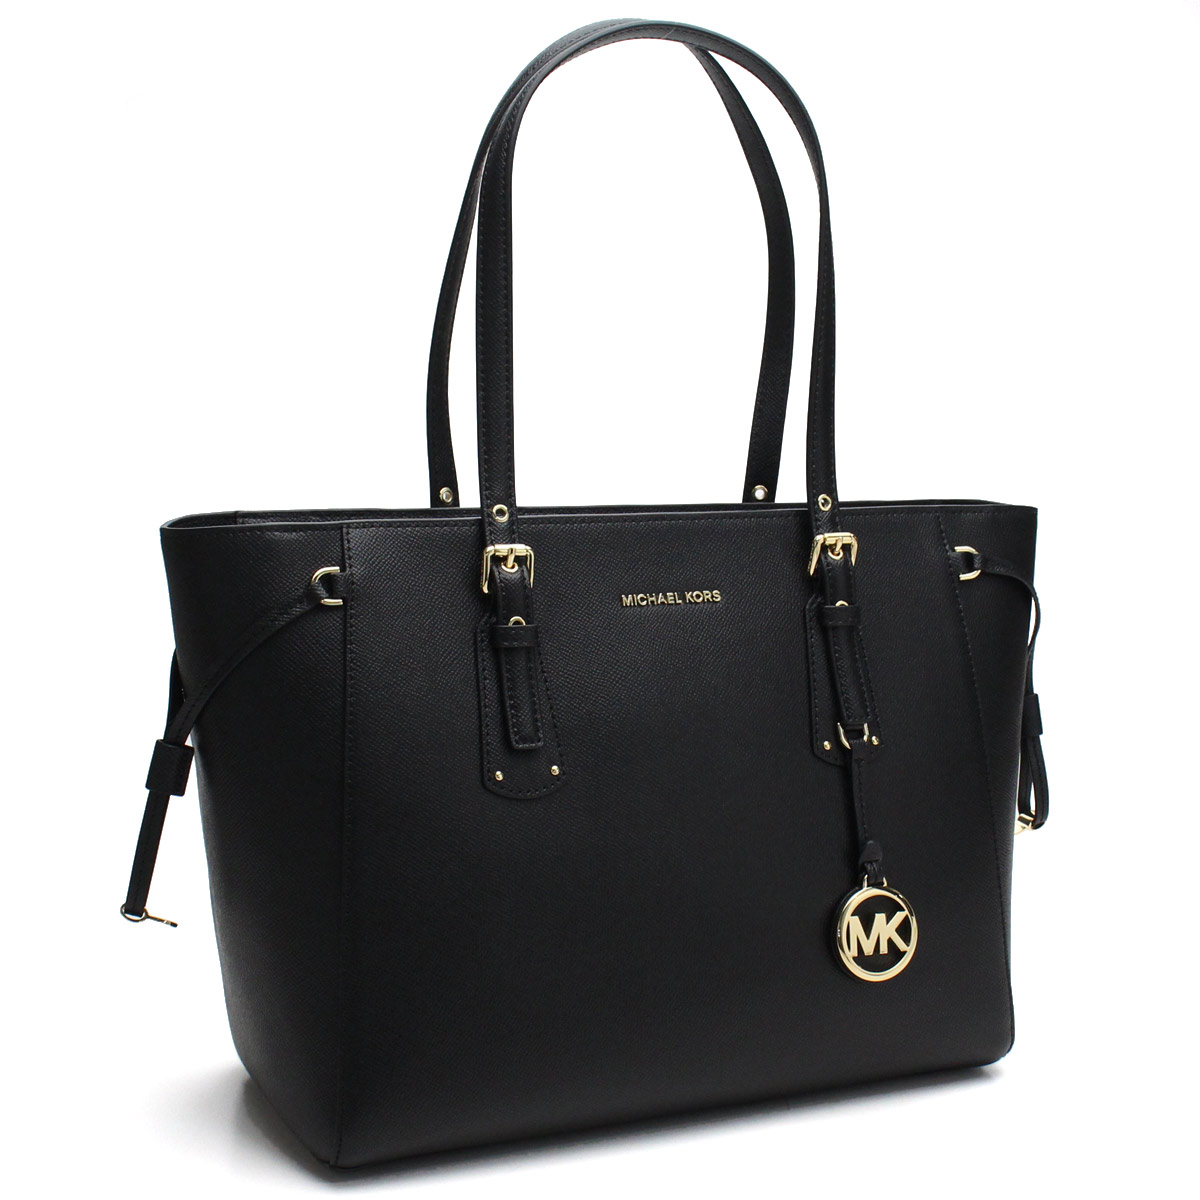 Michael Kors Bag Voyager Tote 30h7gv6t8l Black